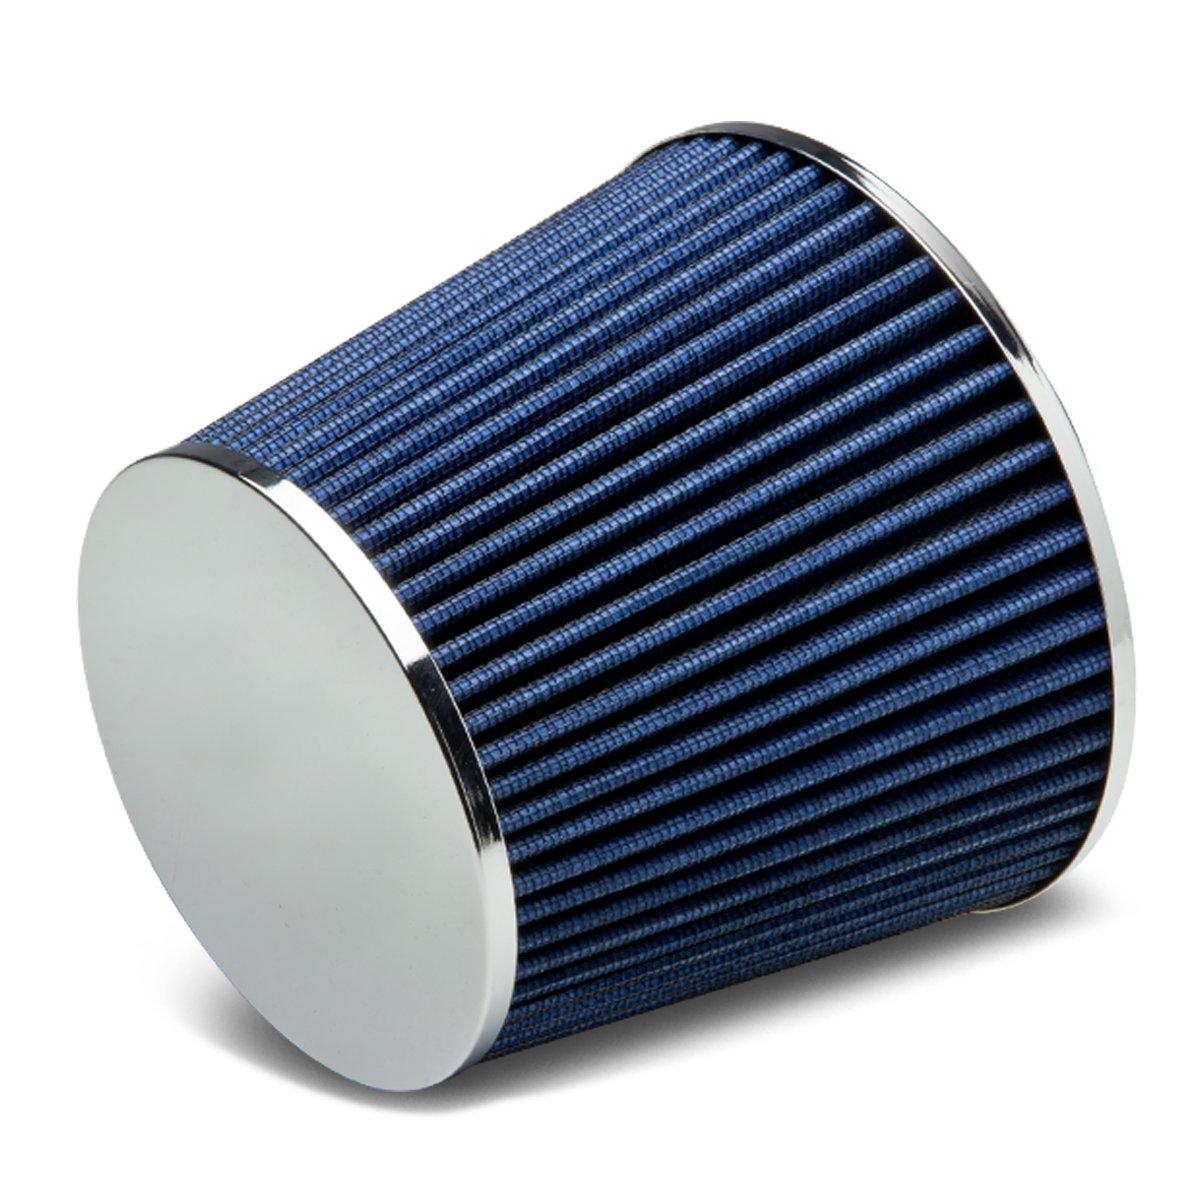 KATUR 4pcs 3157 LED Bulb Super Bright 3047 3057 3057A 3155 3157A 3014 54SMD Lens 3.5W DC 12V LED Replacement Bulbs Turn Brake Signal Tail Back Up Stop Parking RV Lights White